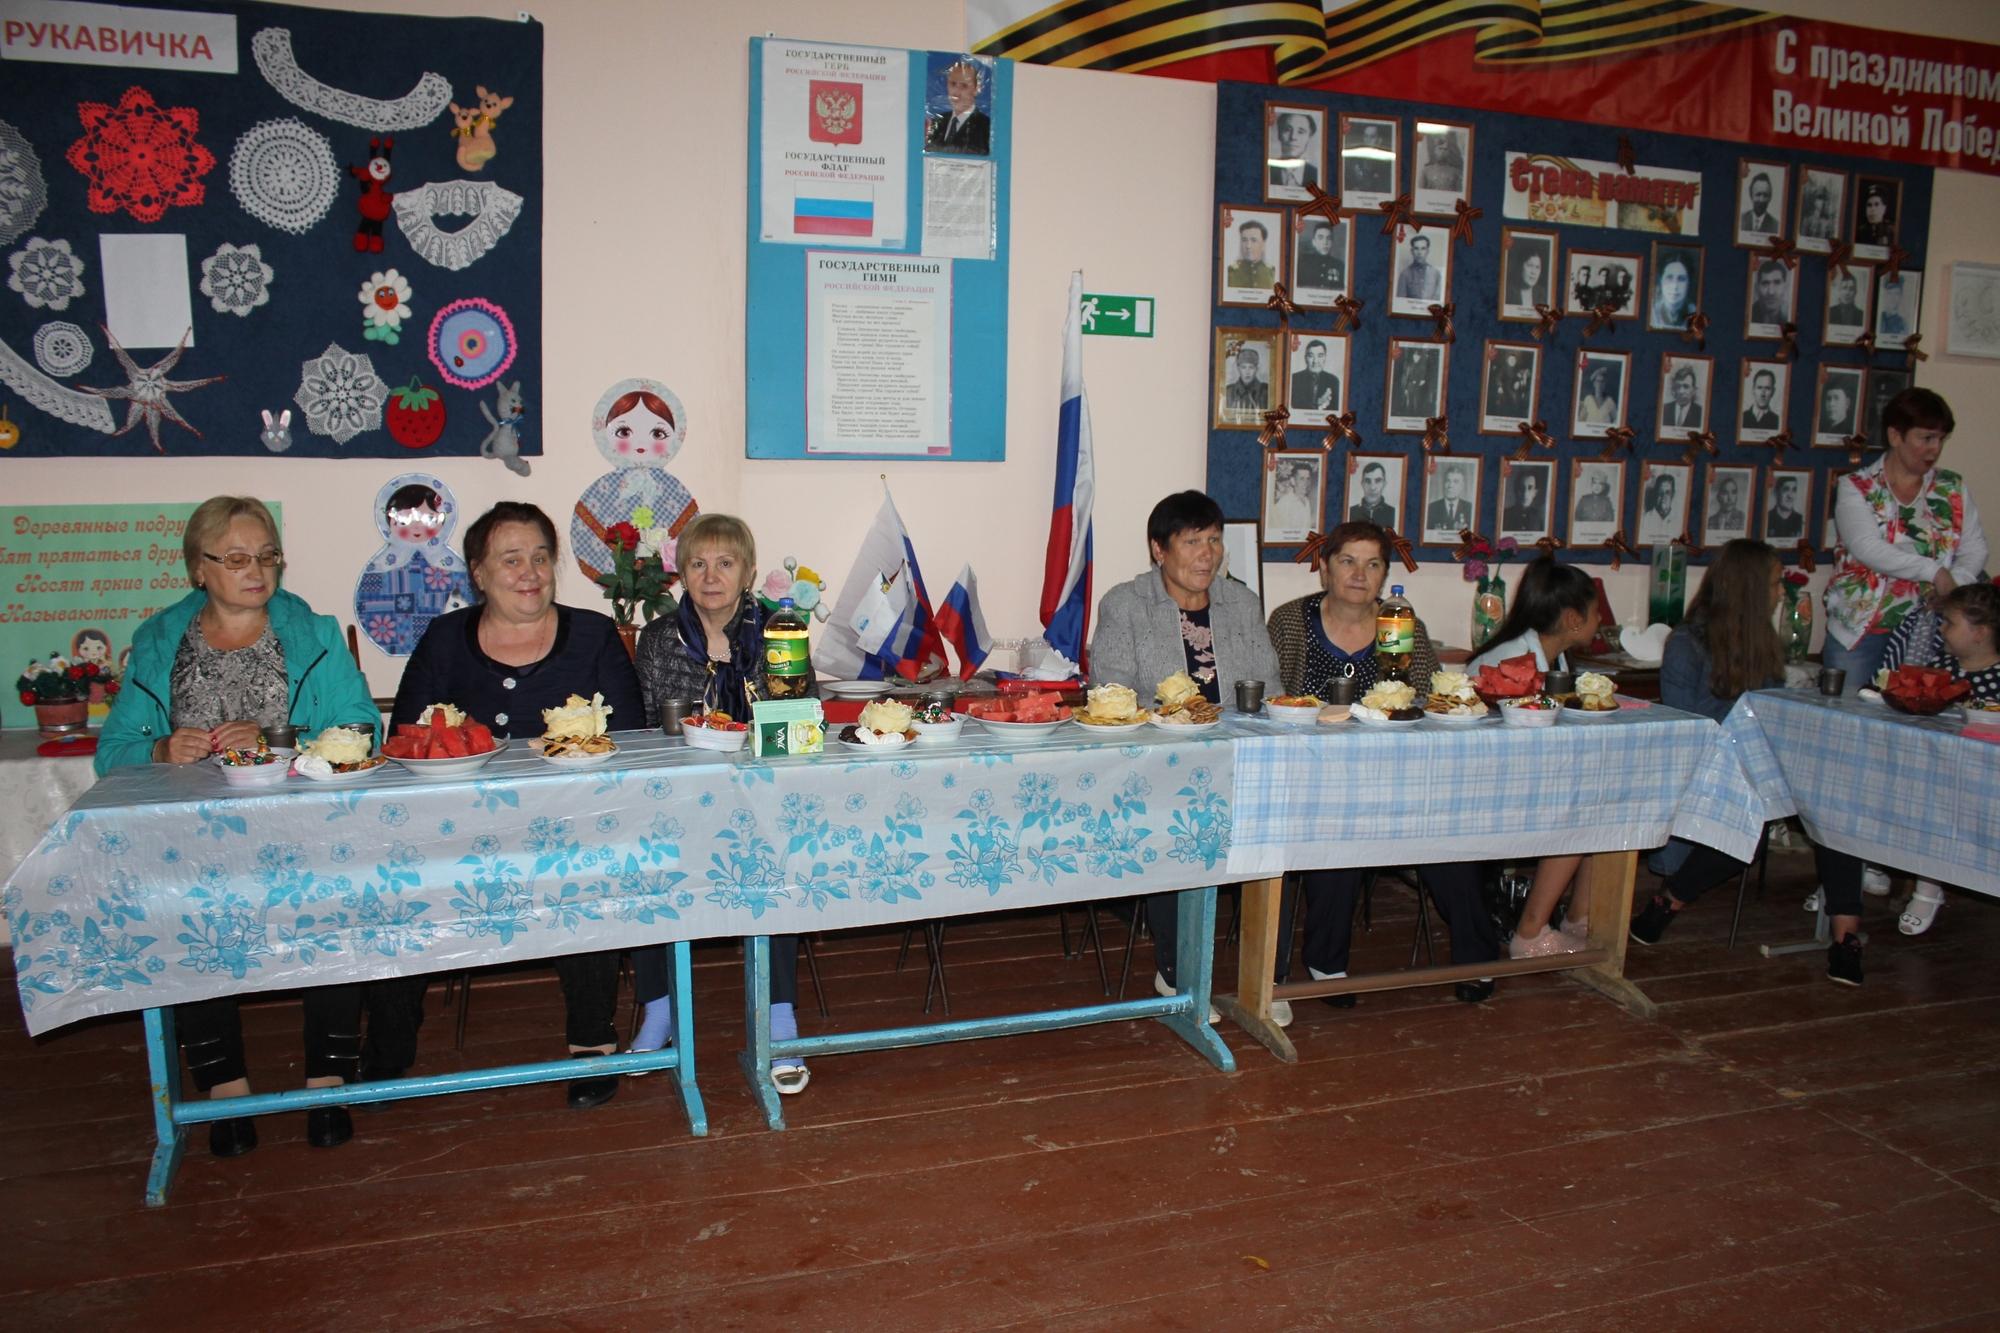 0702-bastanovo-17082019-gazete-na-beregax-leyi-2-goda